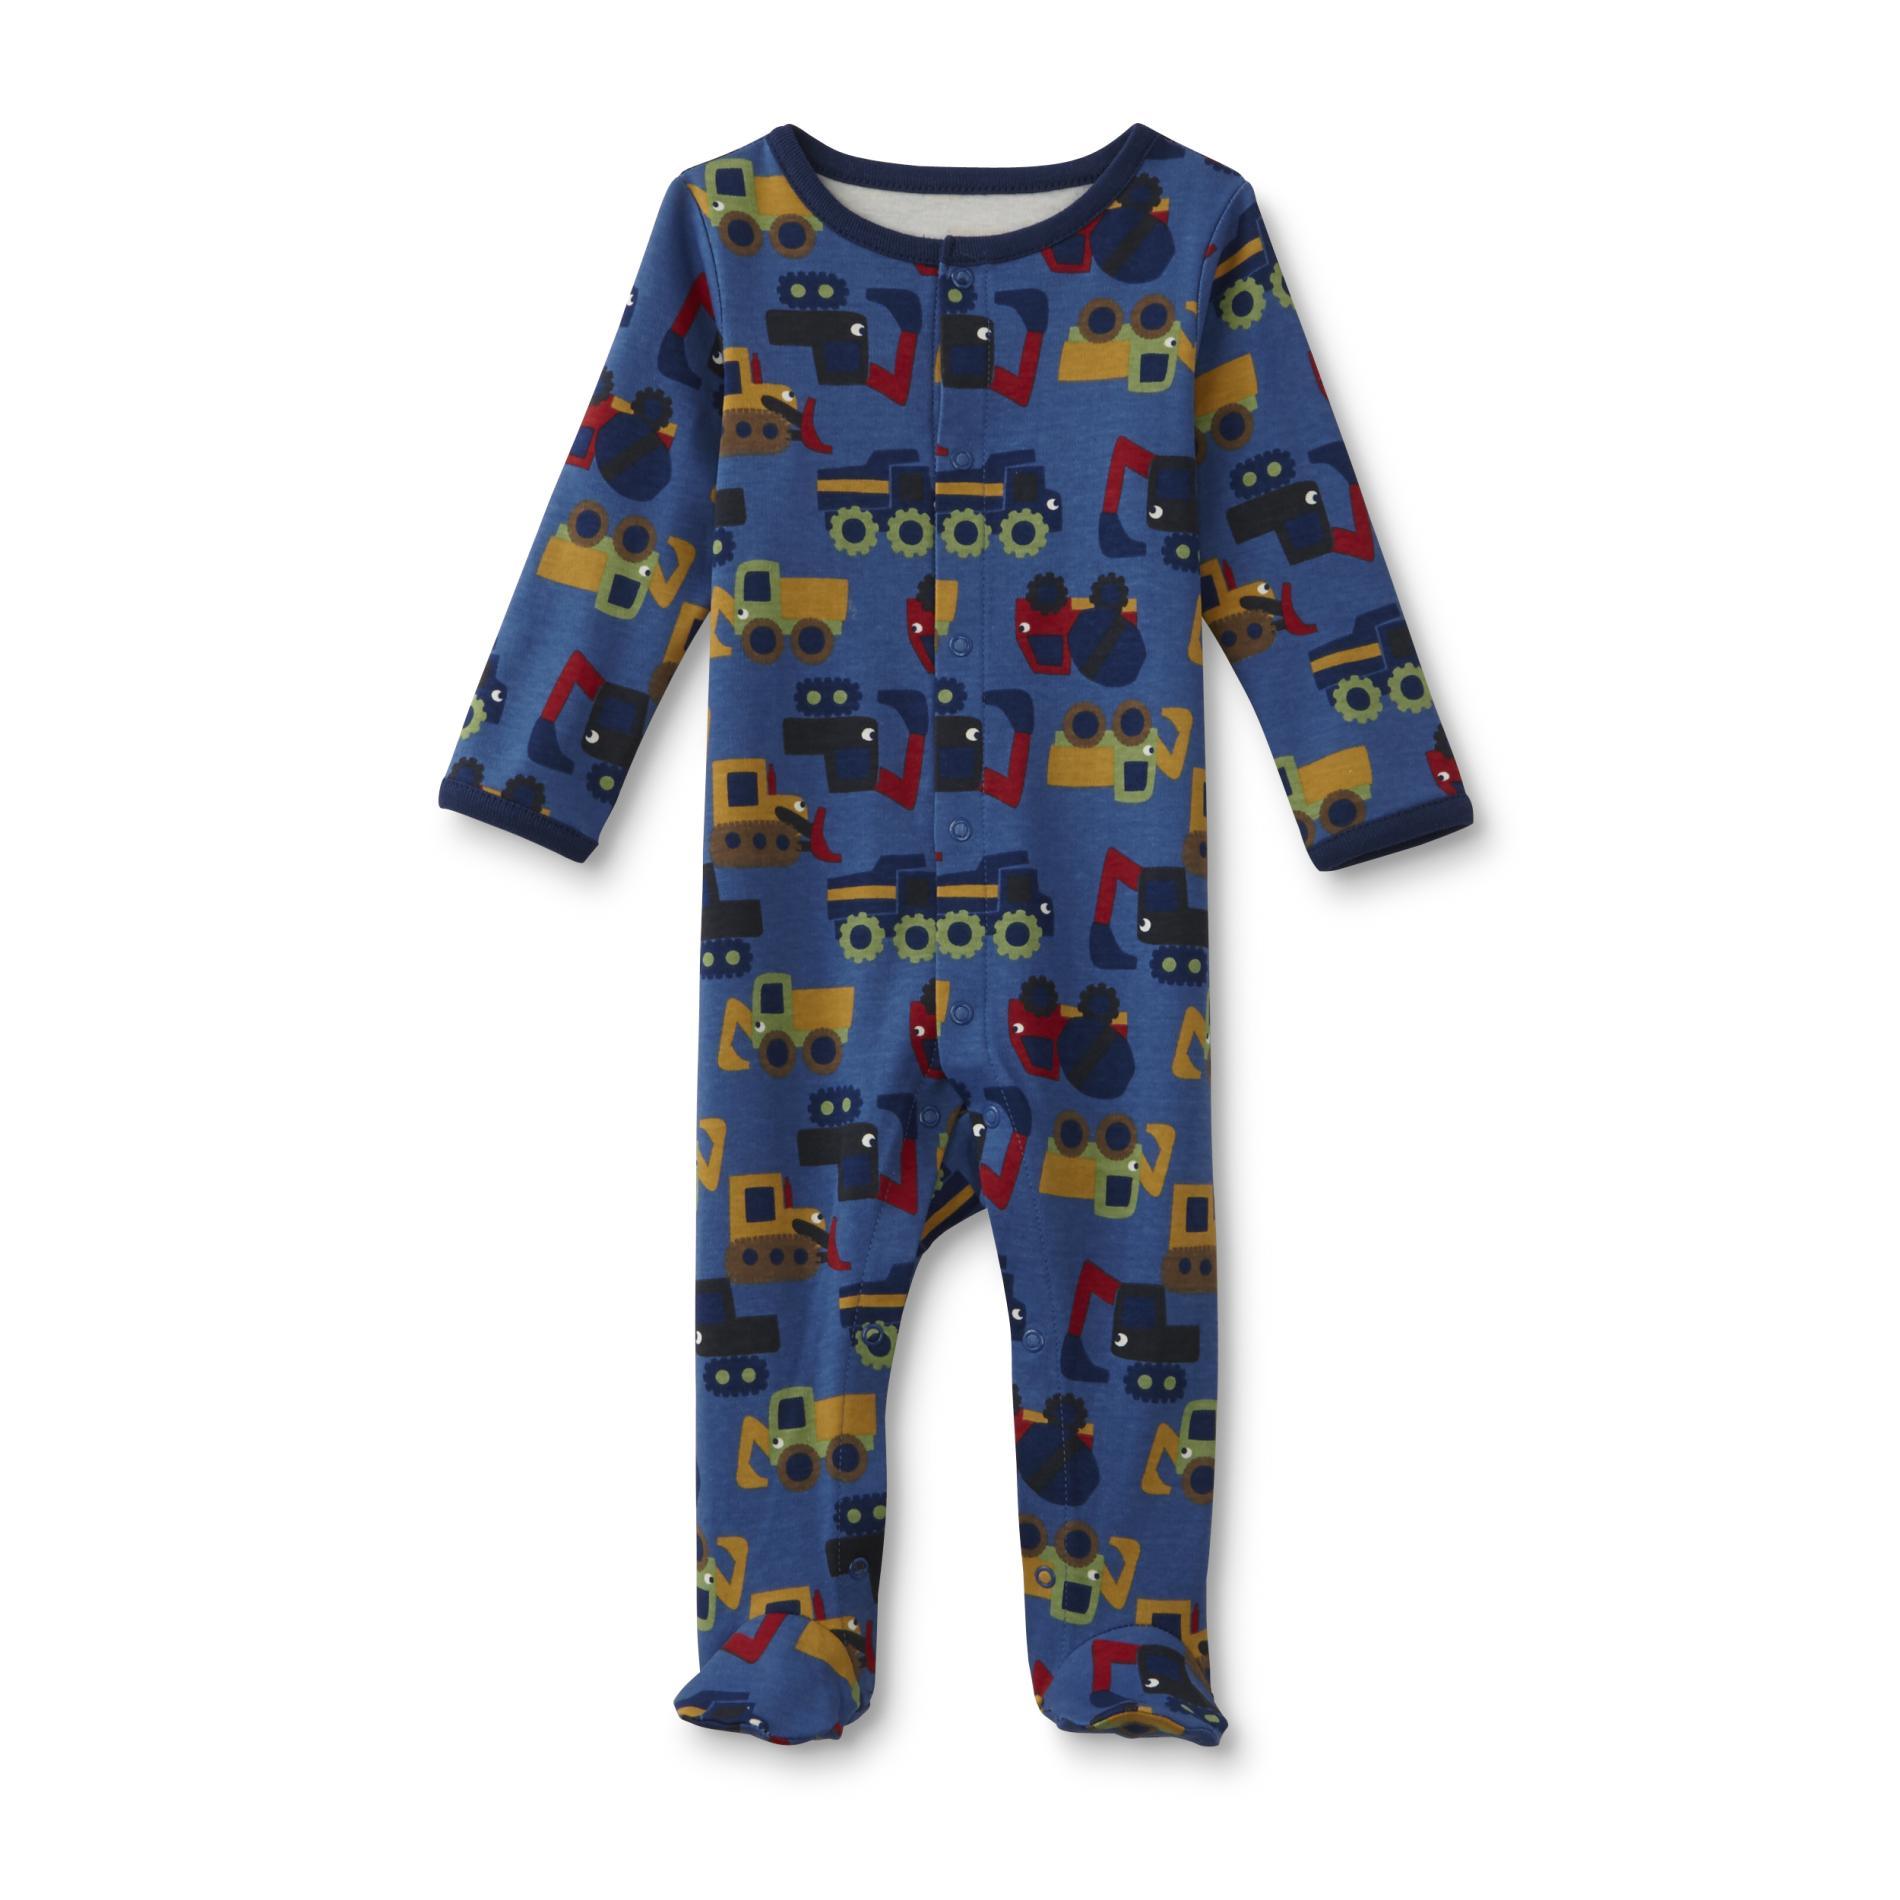 Newborn Boy's Footed Pajamas - Construction